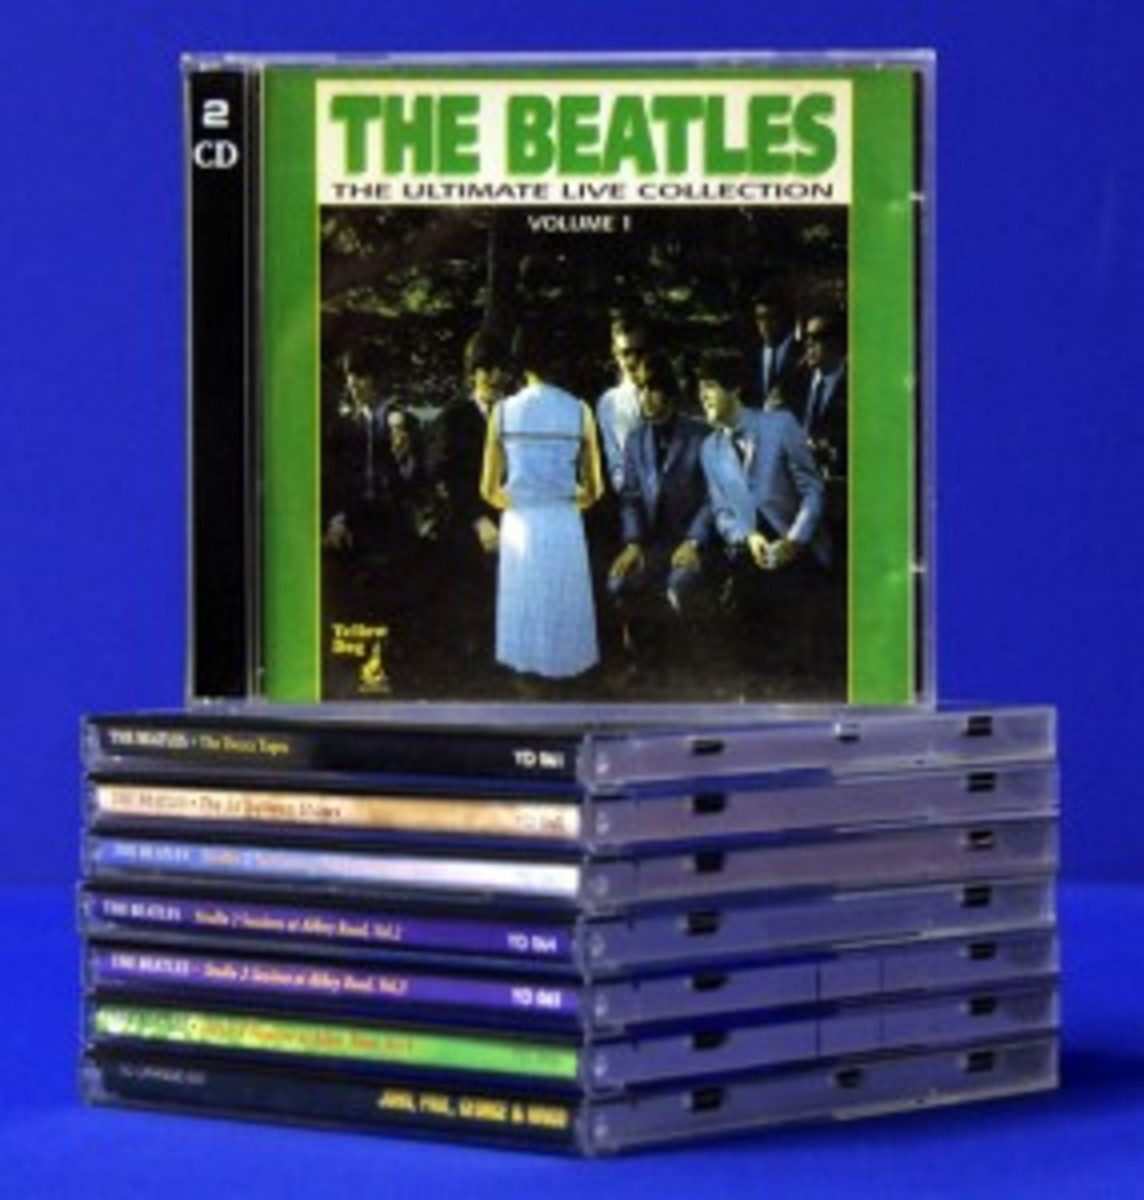 rare beatles CDs